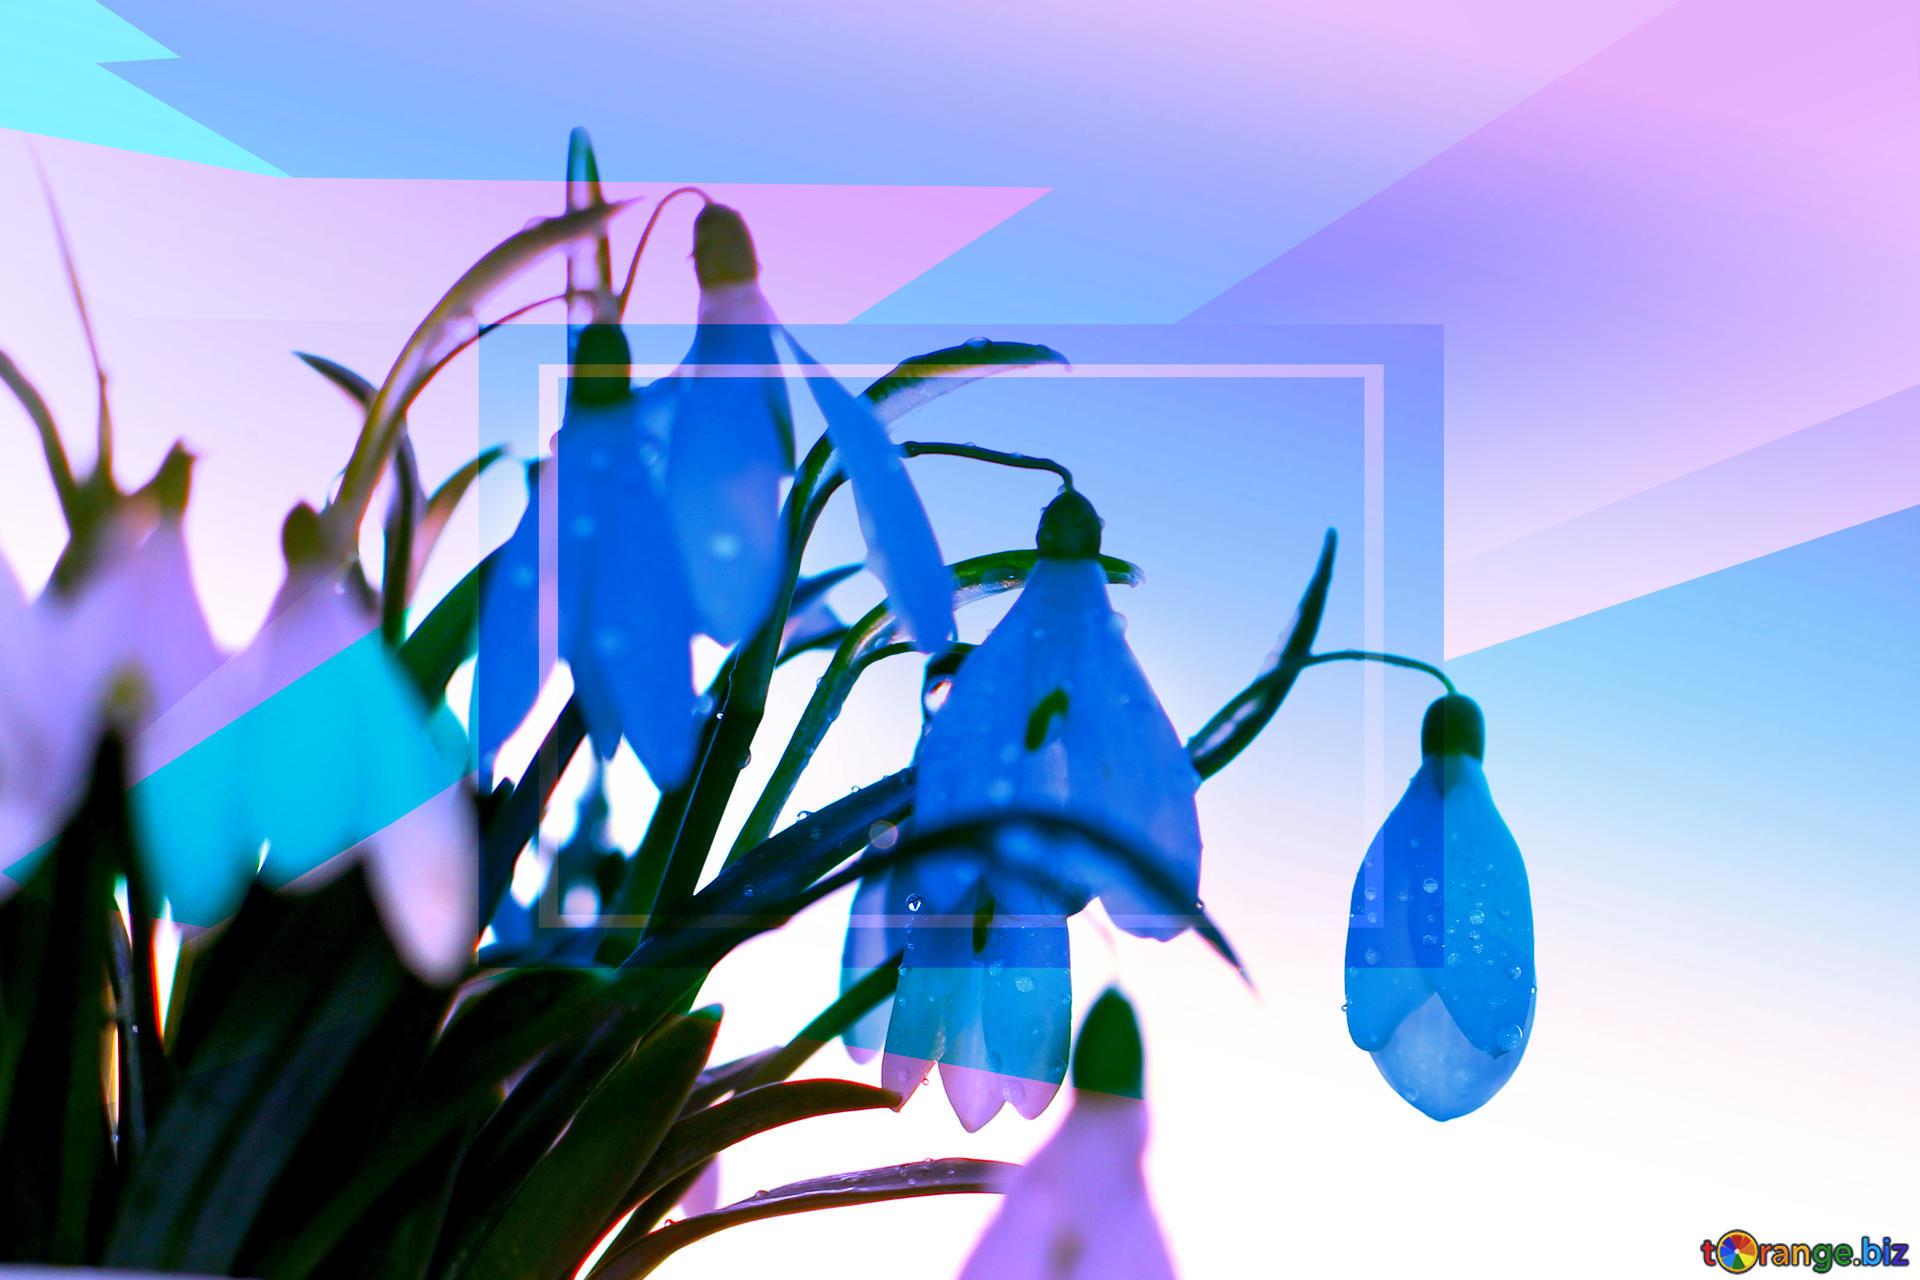 Res: 1920x1280, For the desktop background wallpaper spring Snowdrop Blue blank  illustration template geometric frame